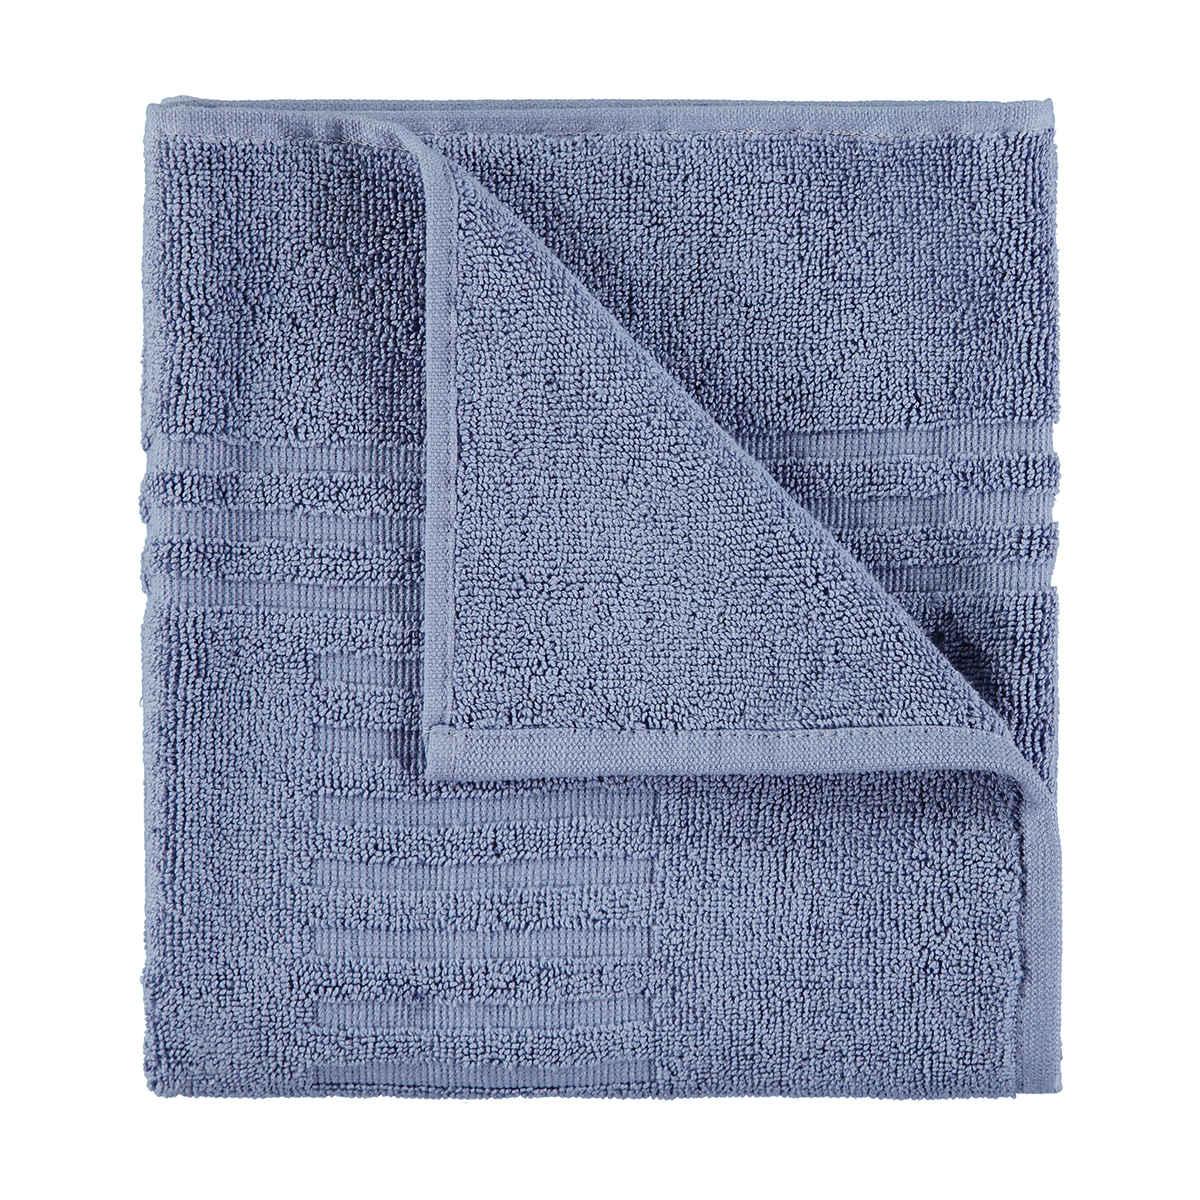 Workout Towel Kmart: Madison Foot Towel - Ocean